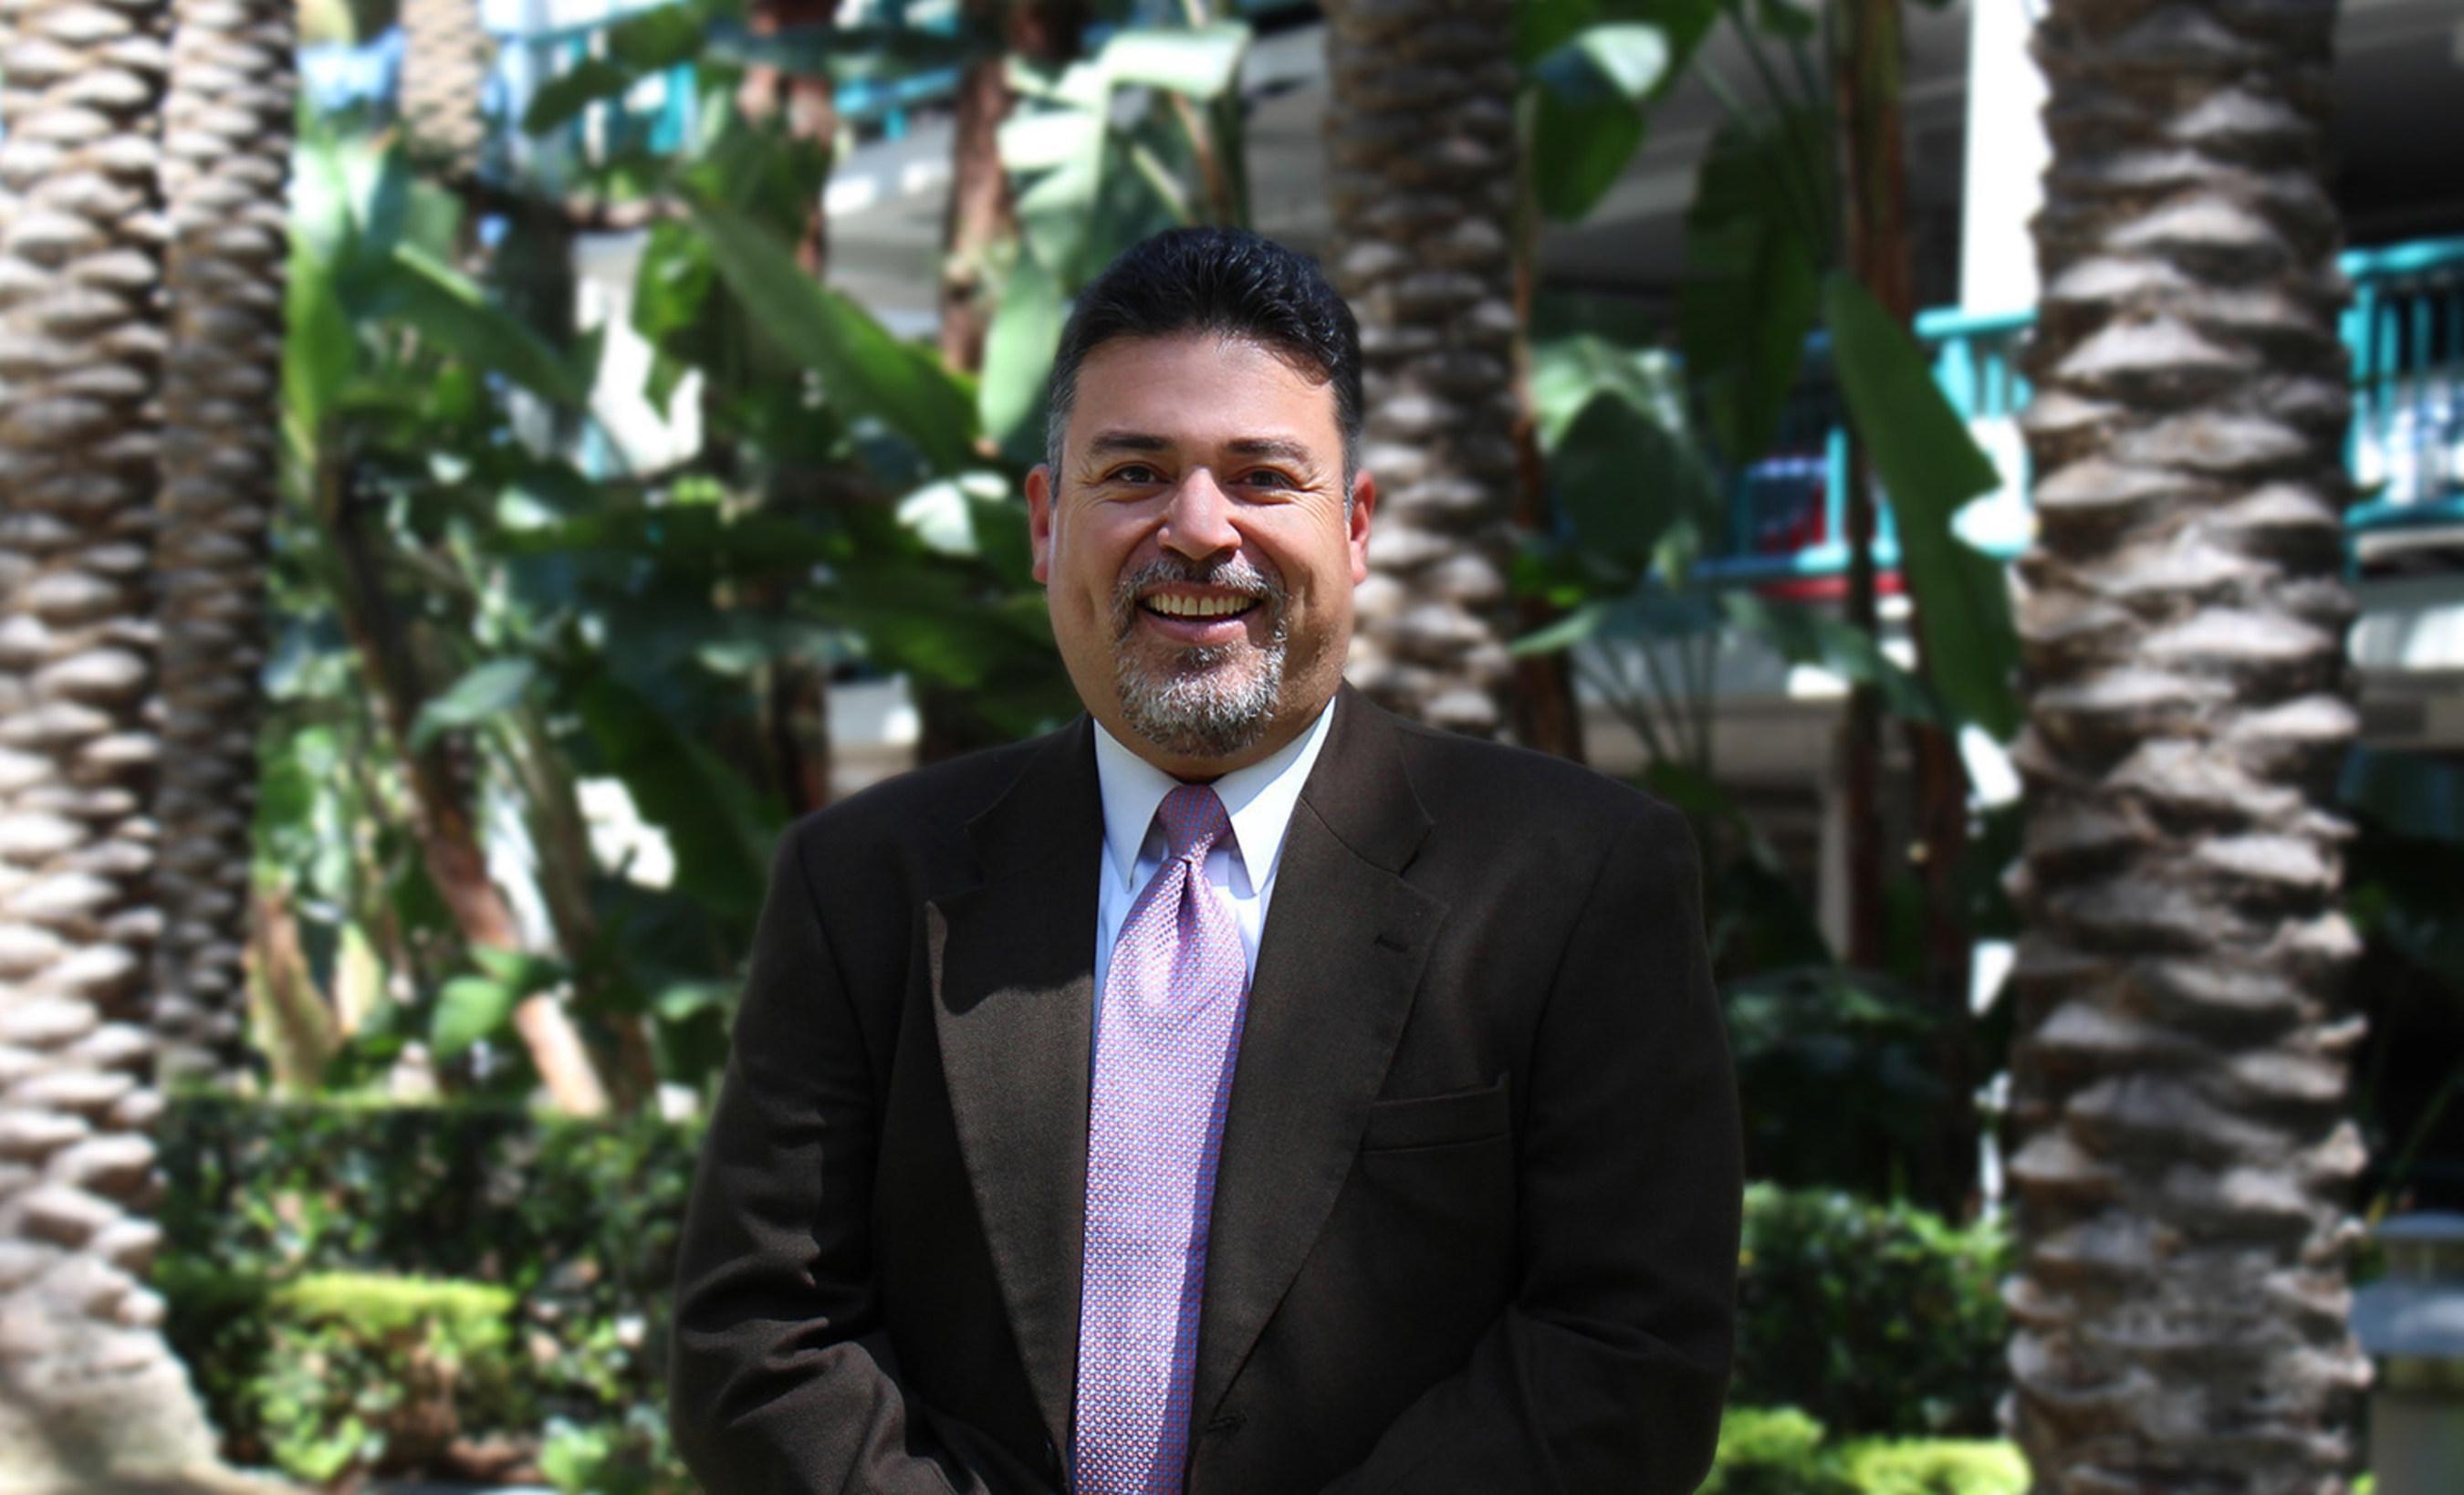 Paul Romero, convention sales director, mid-Atlantic region